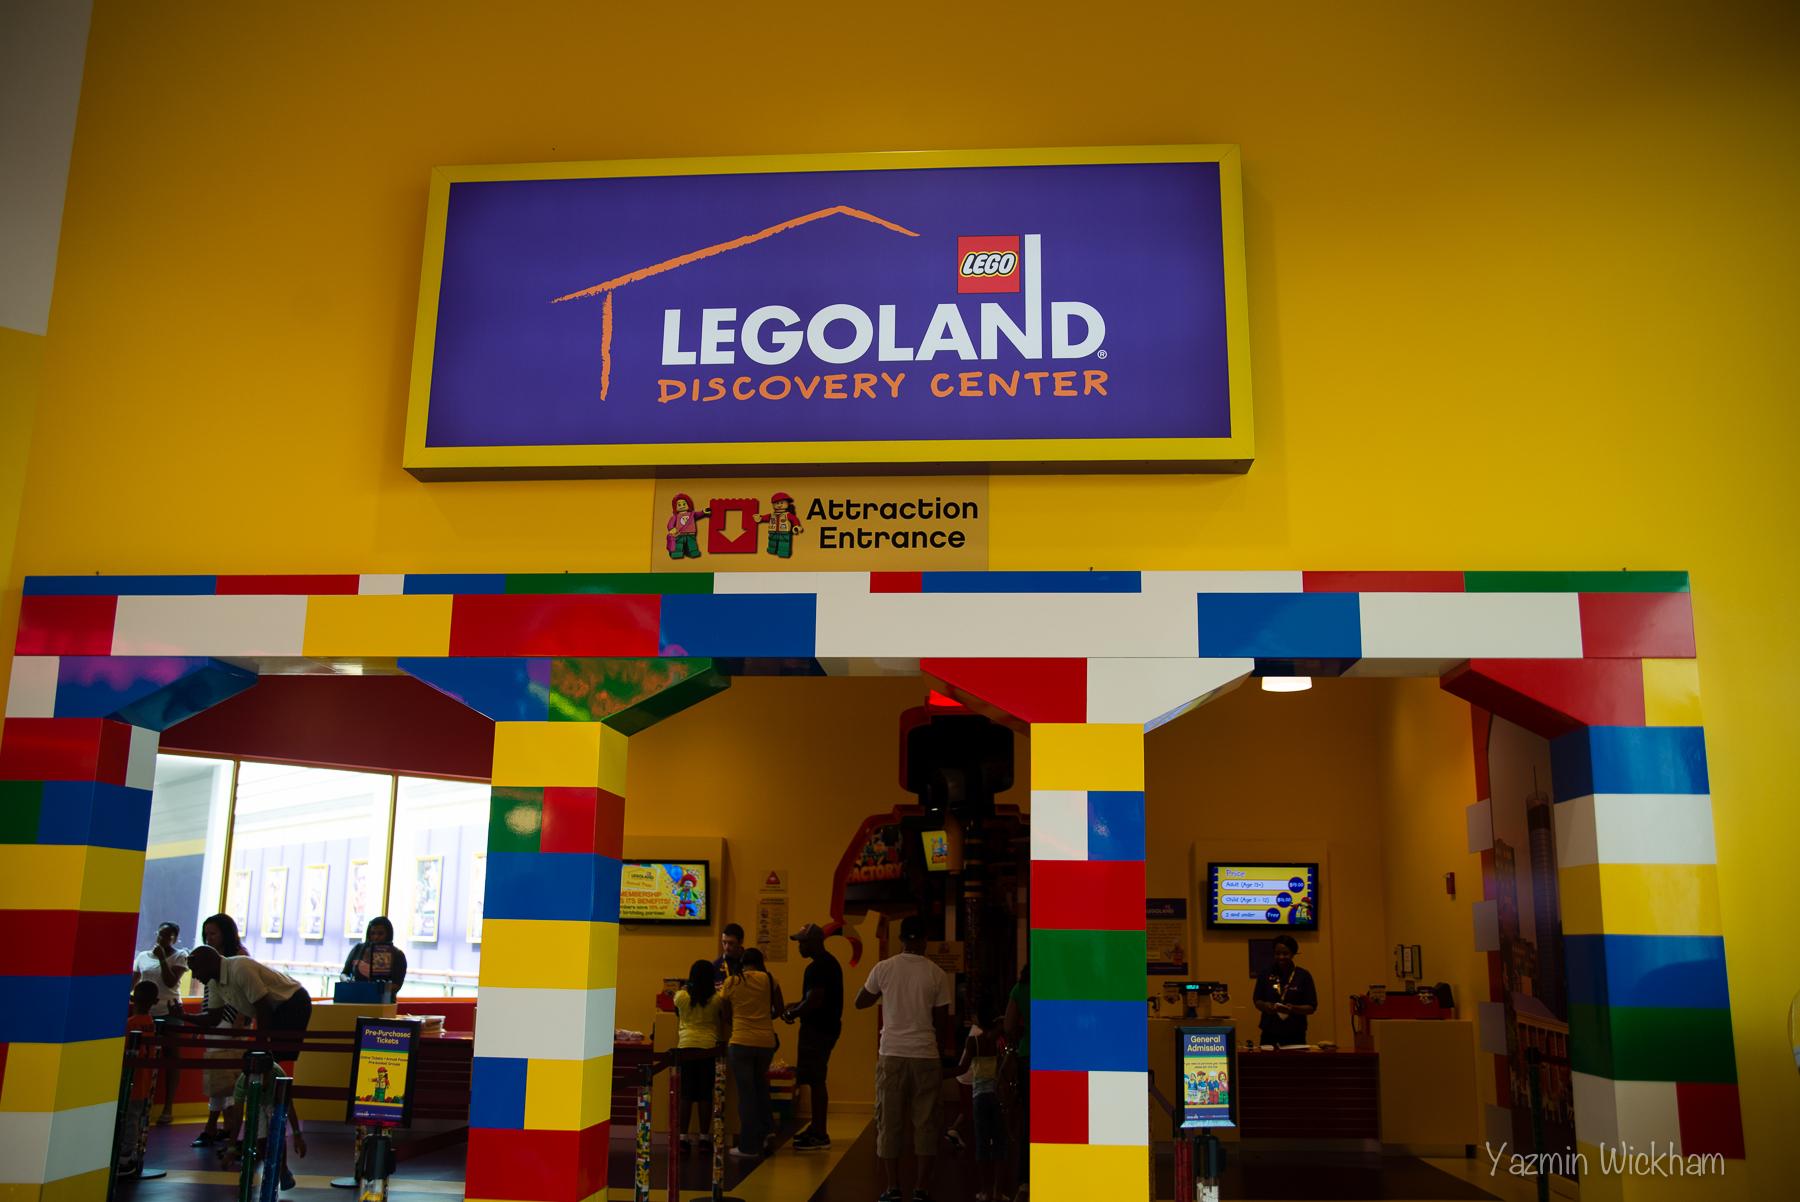 Legoland - Wikipedia